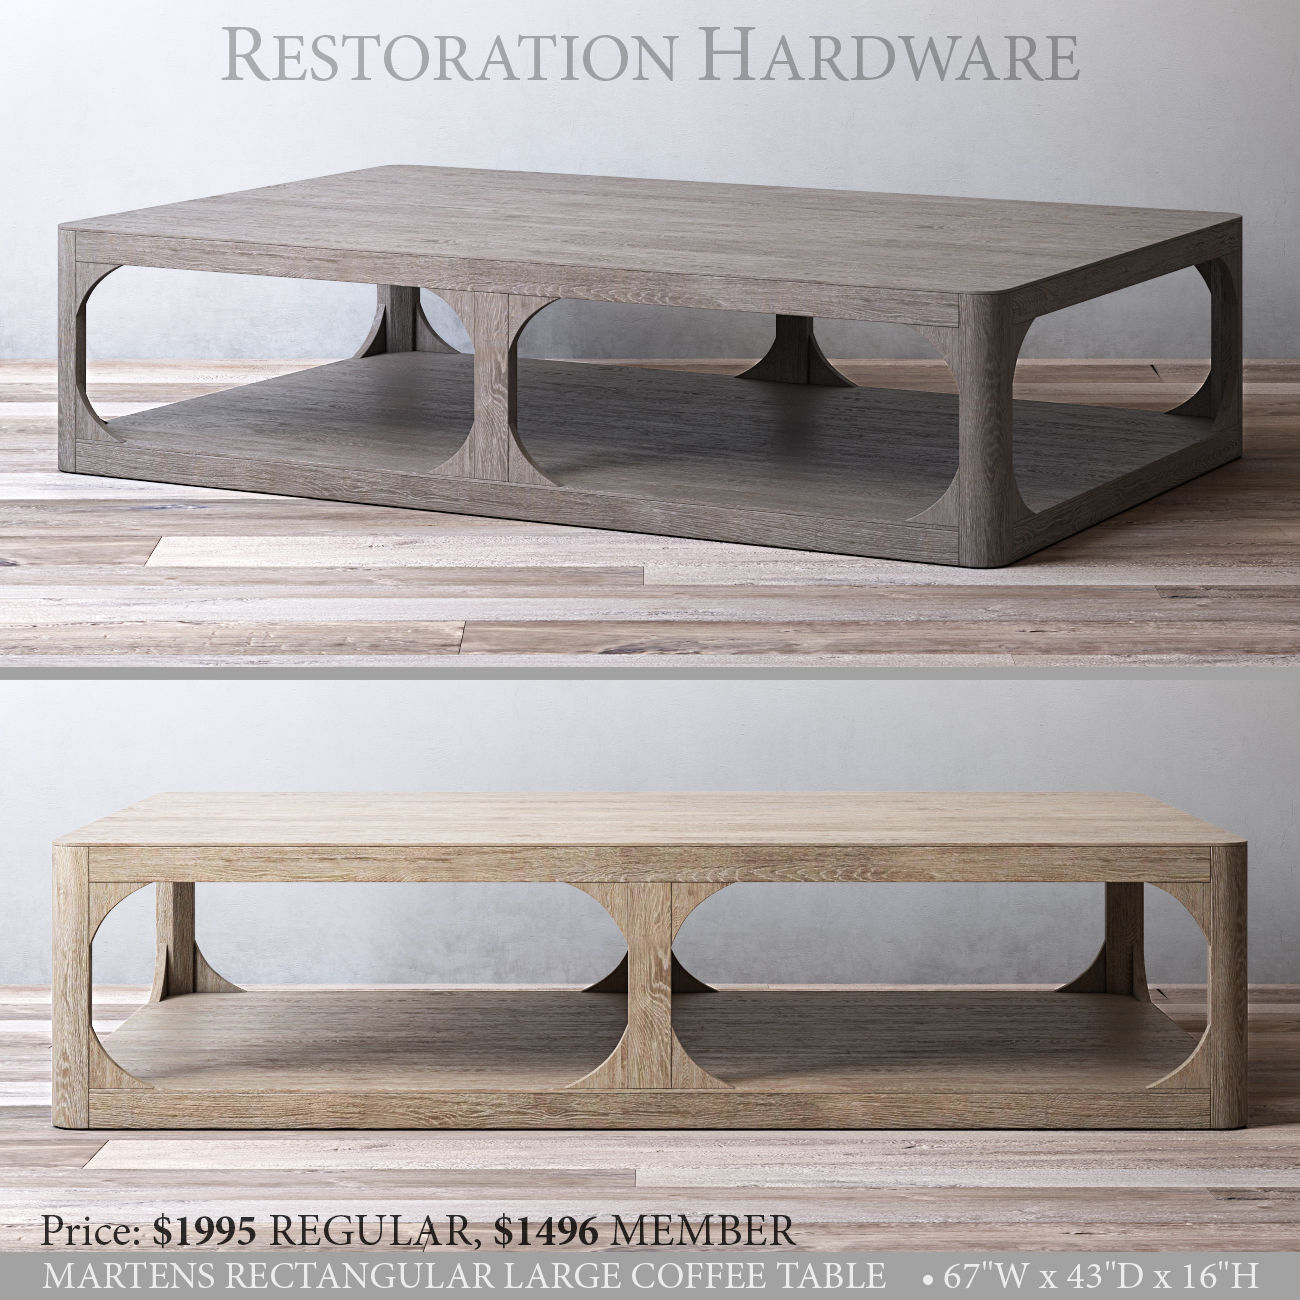 Rh Martens Rectangular Large Coffee Table Model